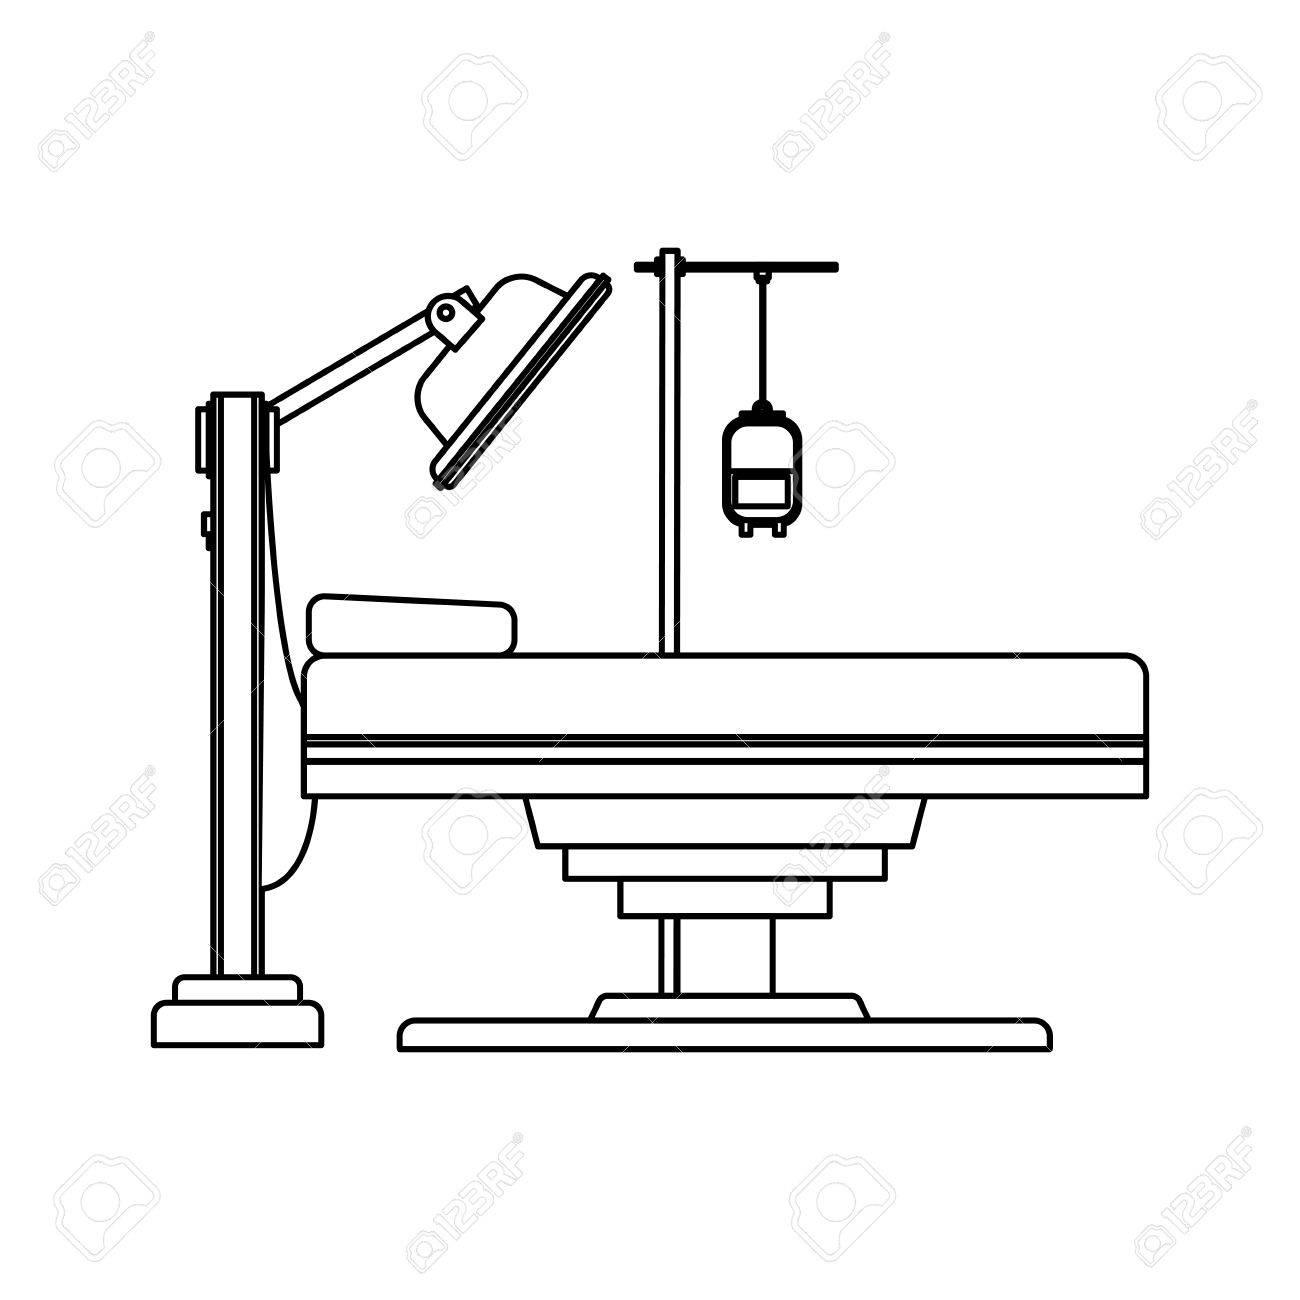 gurney or hospital bed icon image vector illustration design stock vector -  76402993